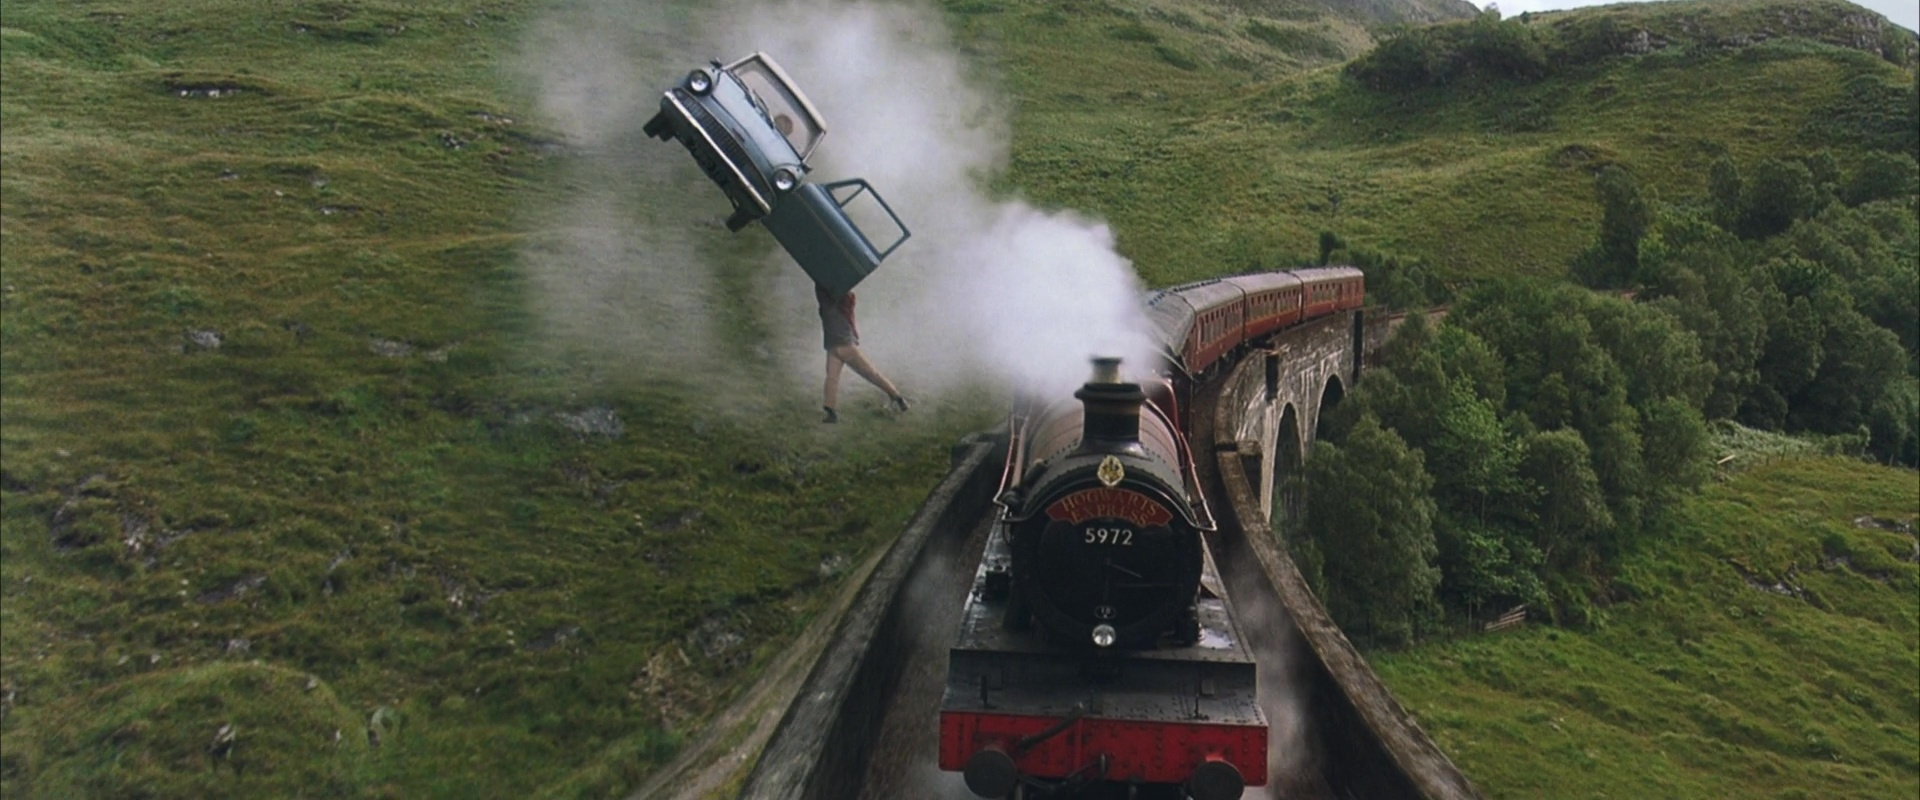 File:Ford Angela and Hogwarts Express.jpg